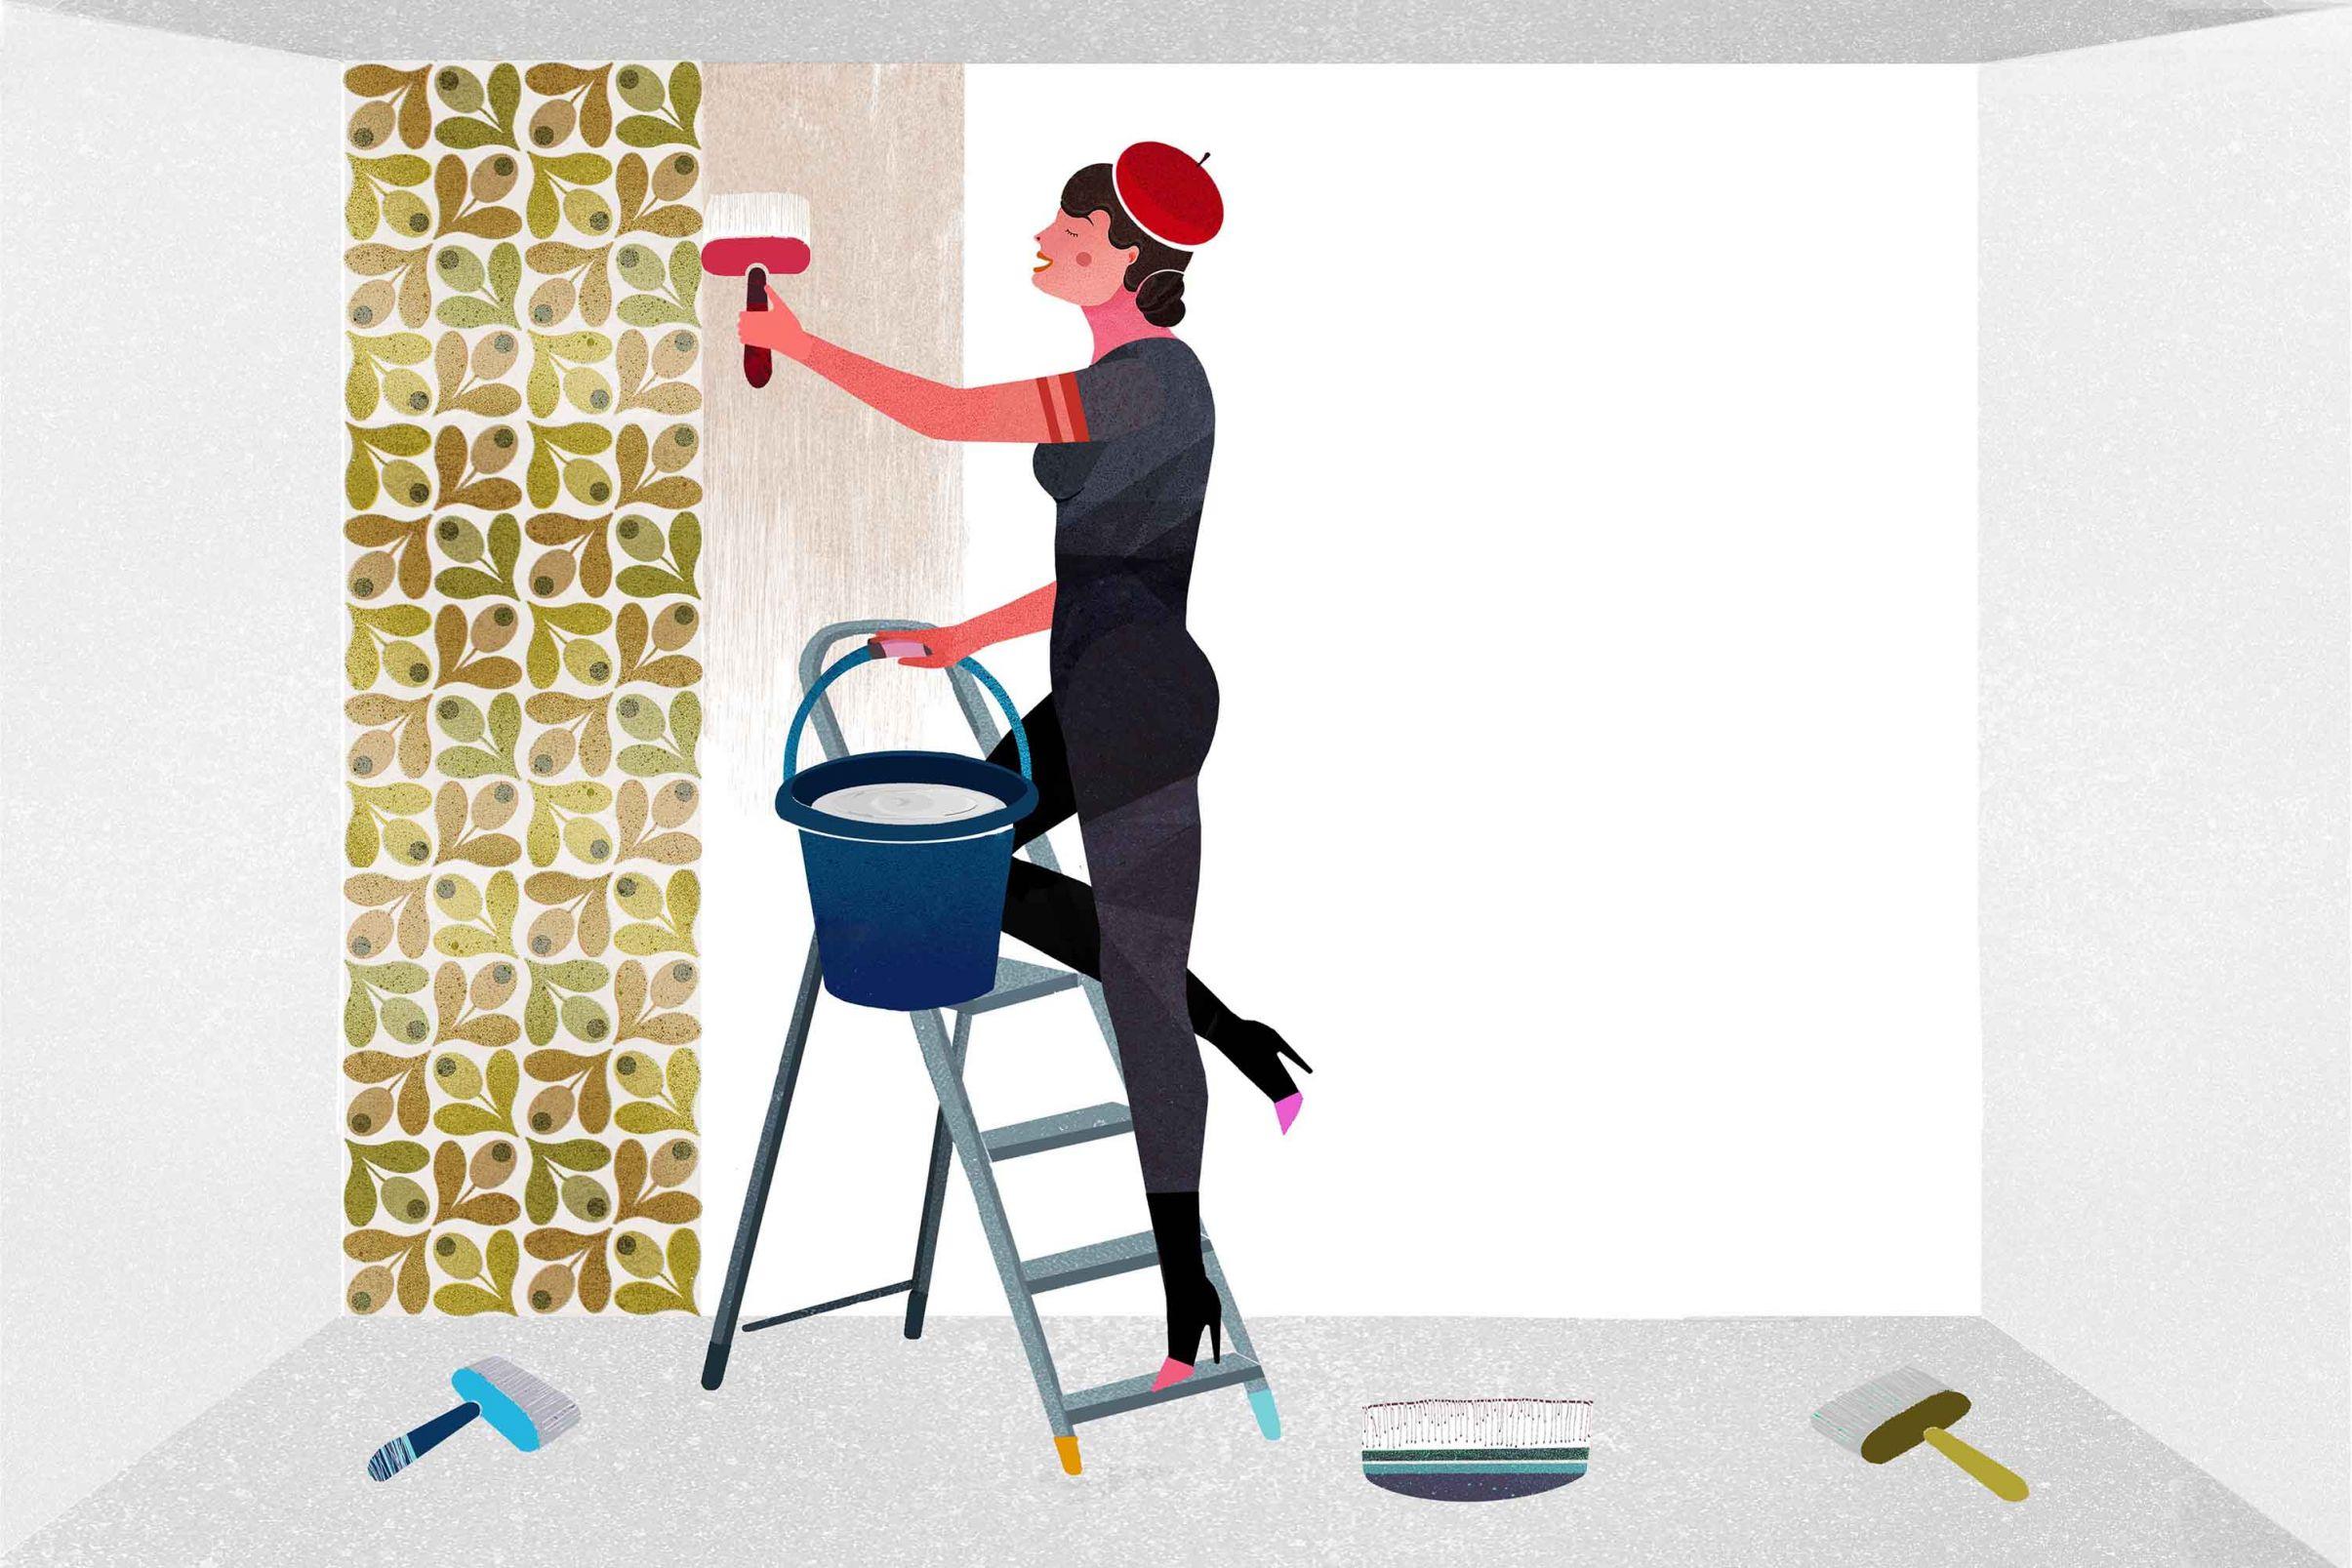 Como-pendurar-papel-de-parede-TNT-Colocar-cola-na-parede